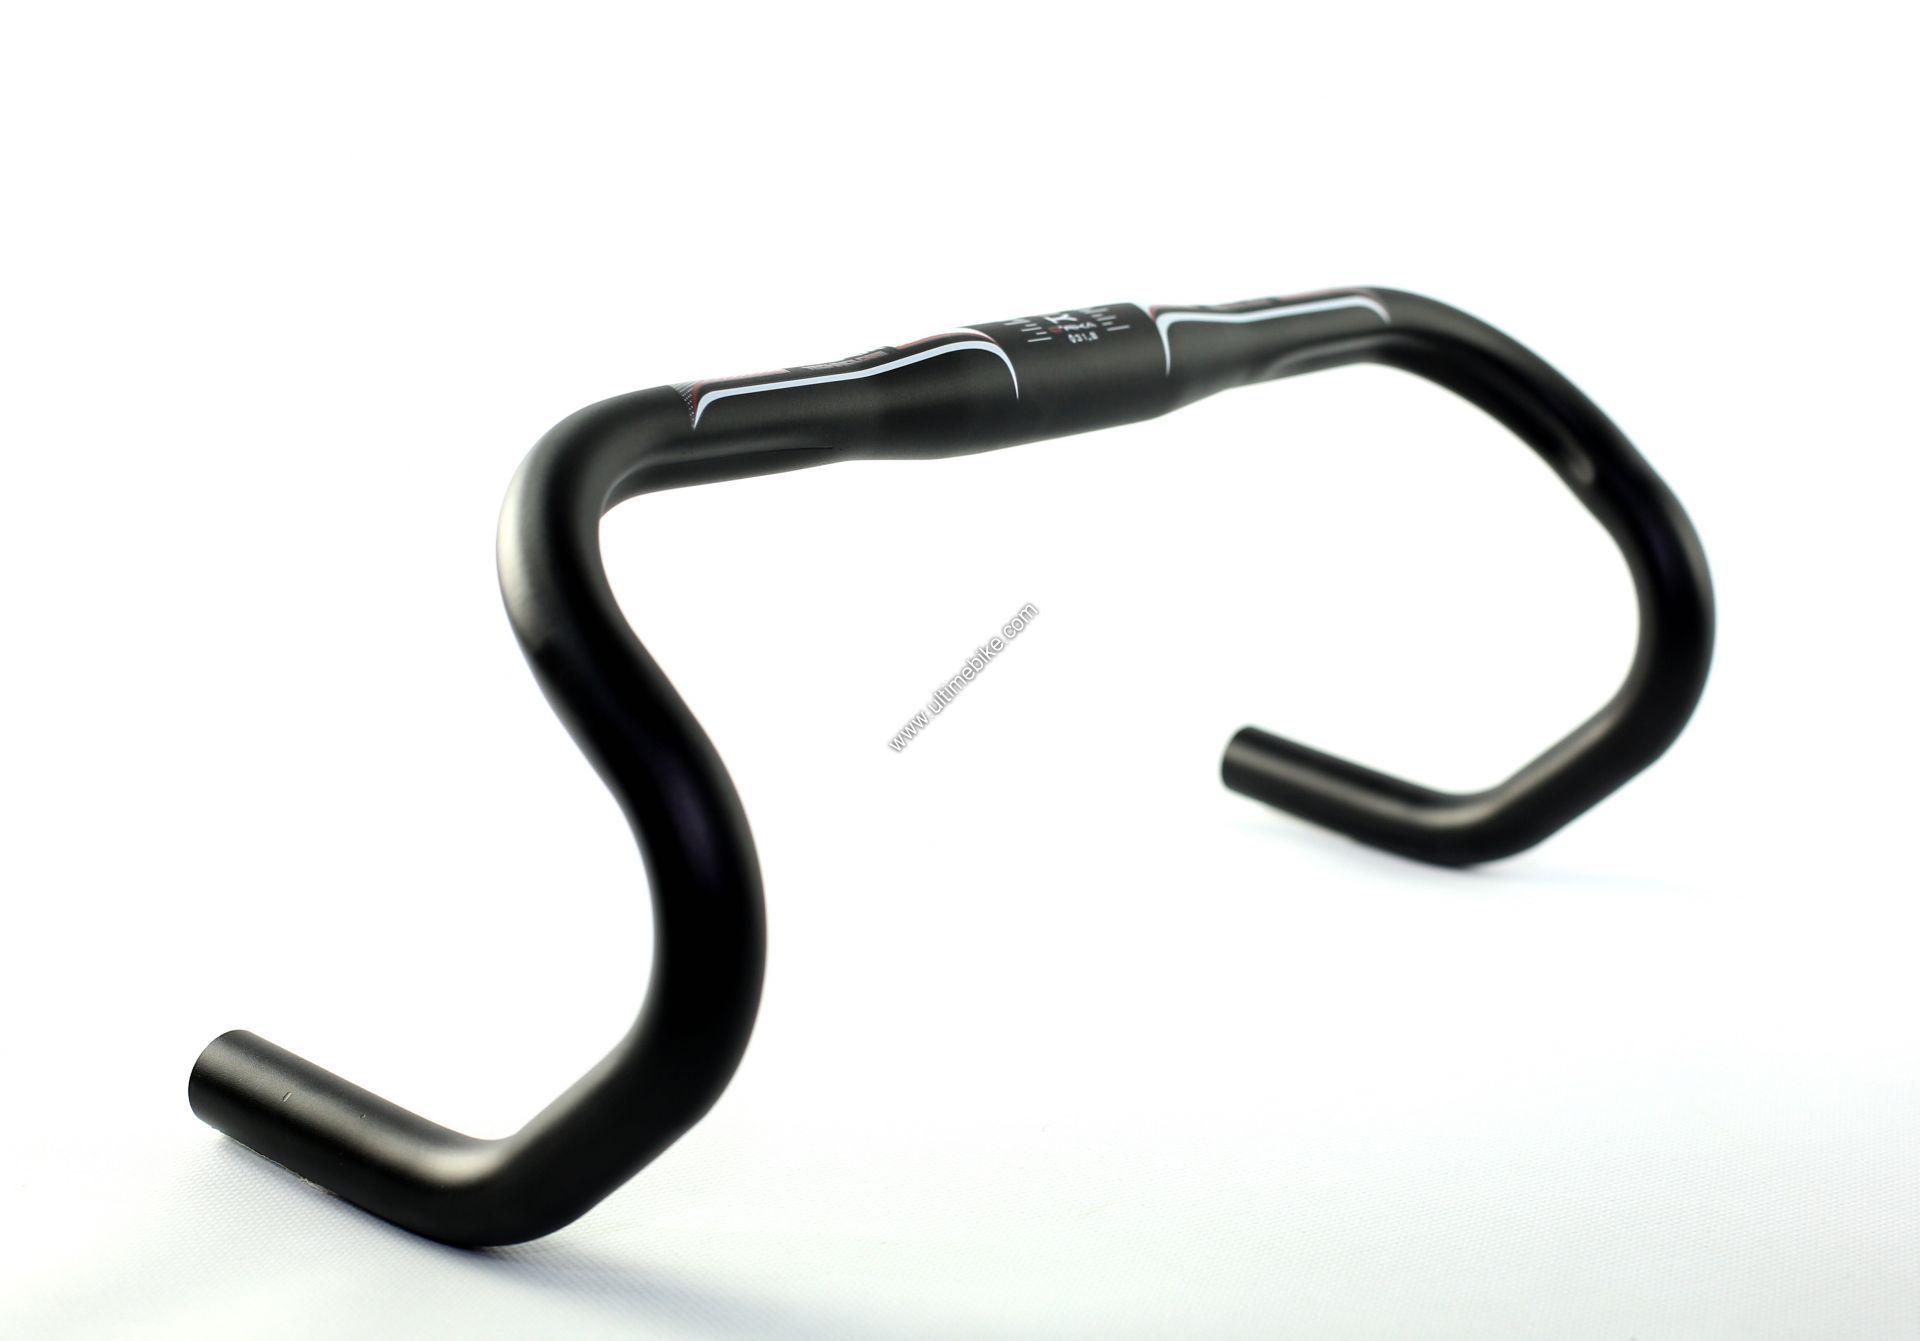 Cintre route ergonomique 40 cm alu noir